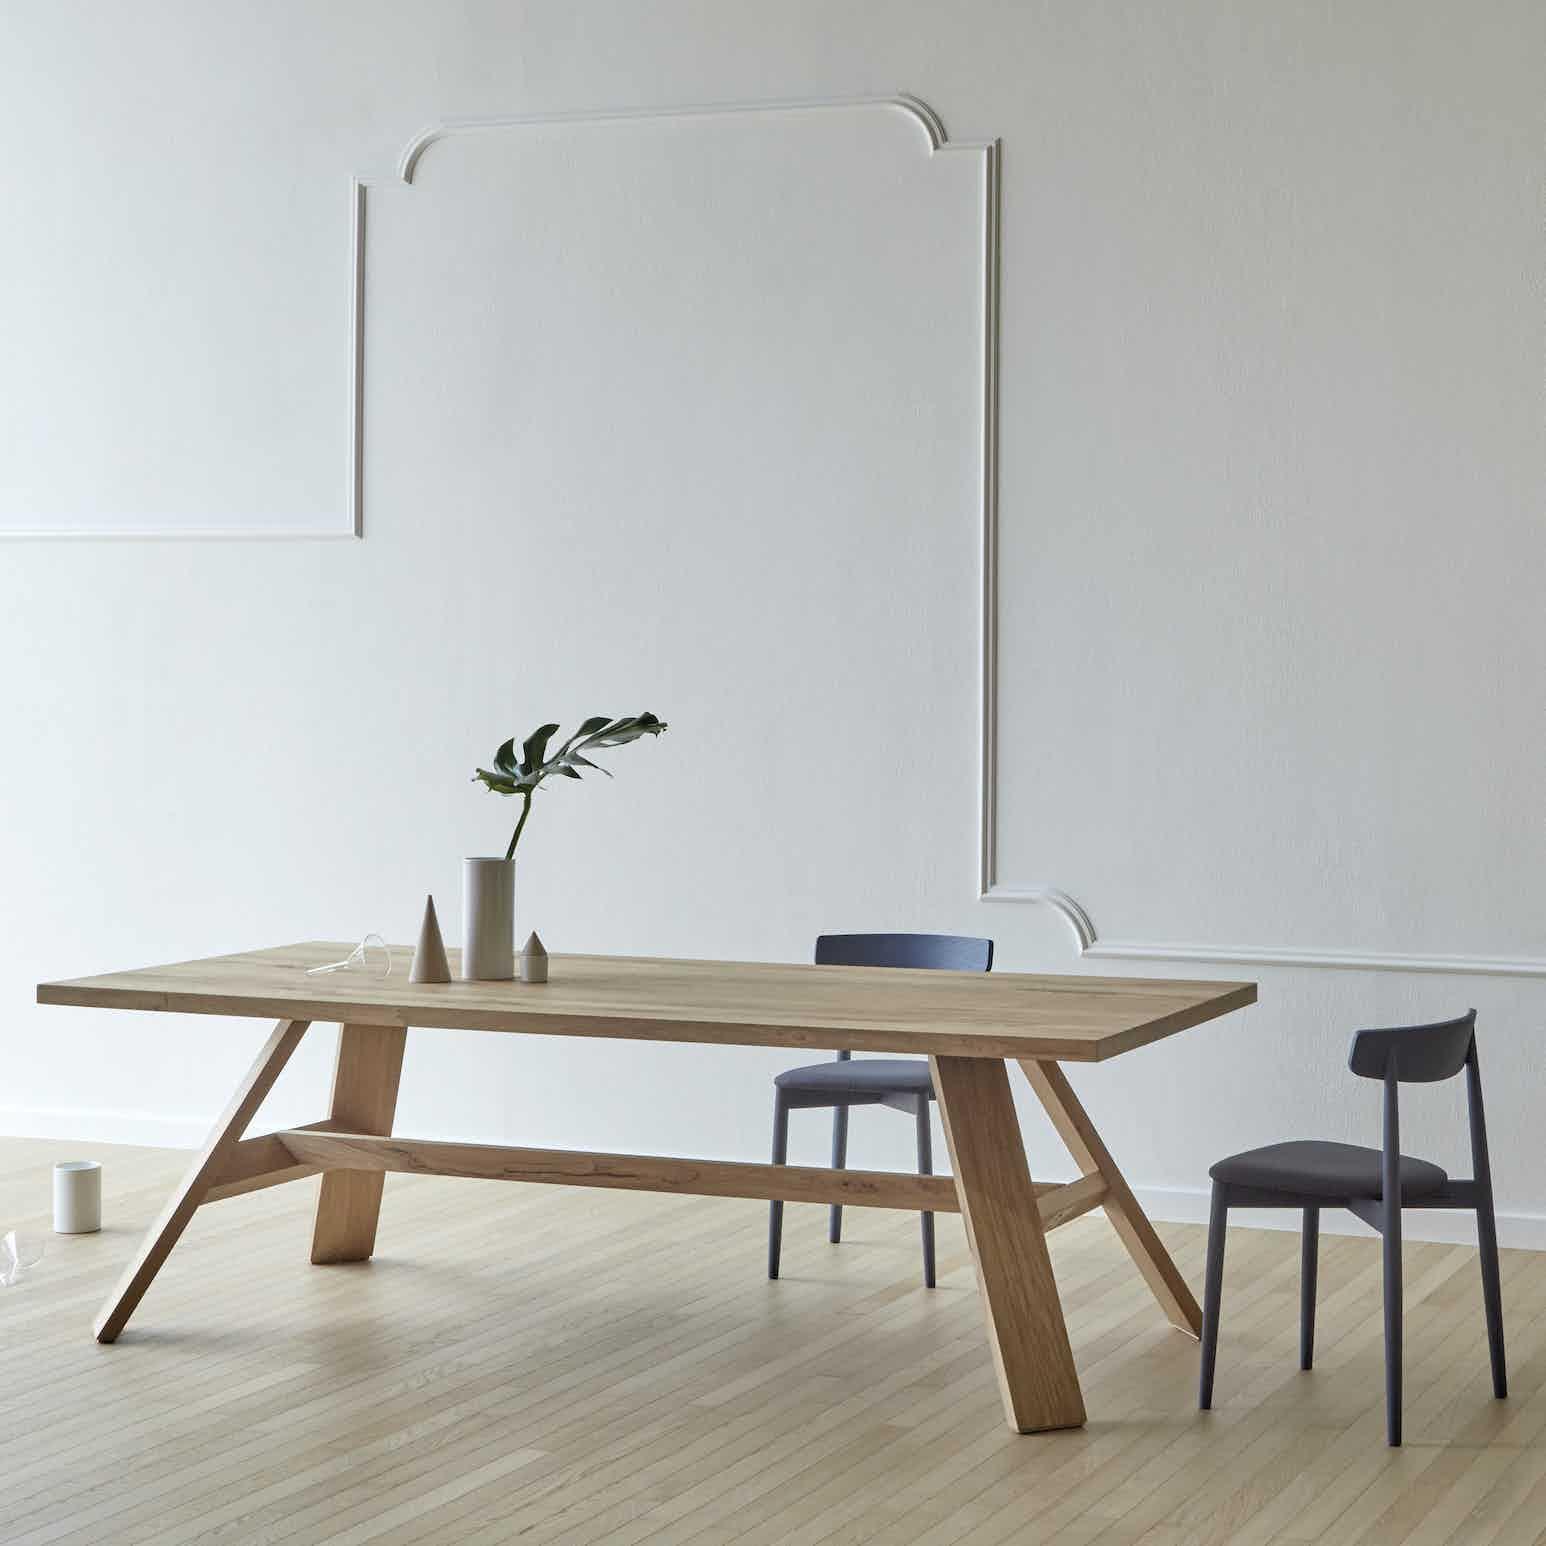 Miniforms Artigiano Table Angle Haute Living